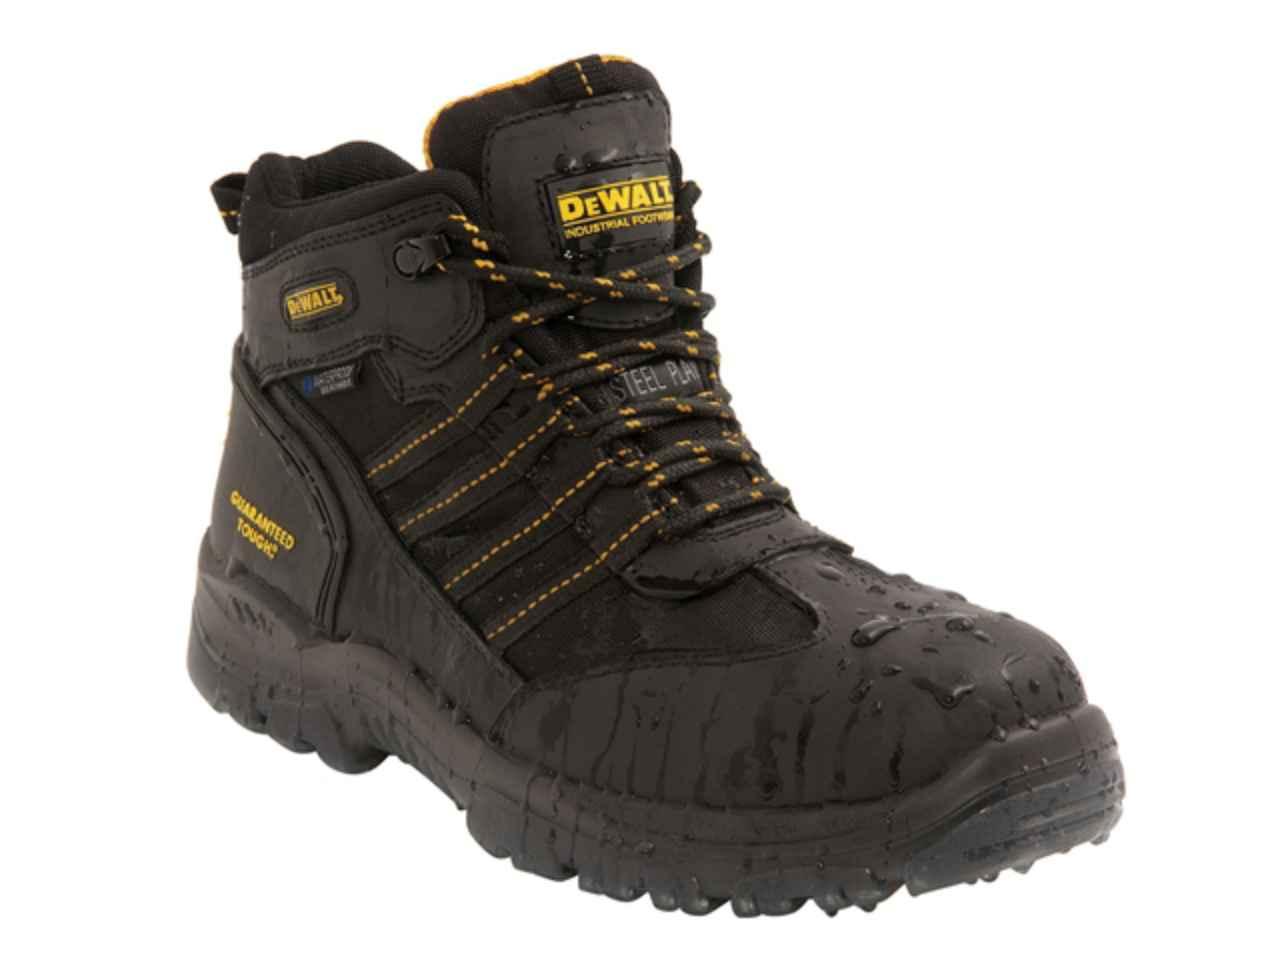 d9b0736d139 DeWalt Nickel S3 Black Safety Boots Various Sizes